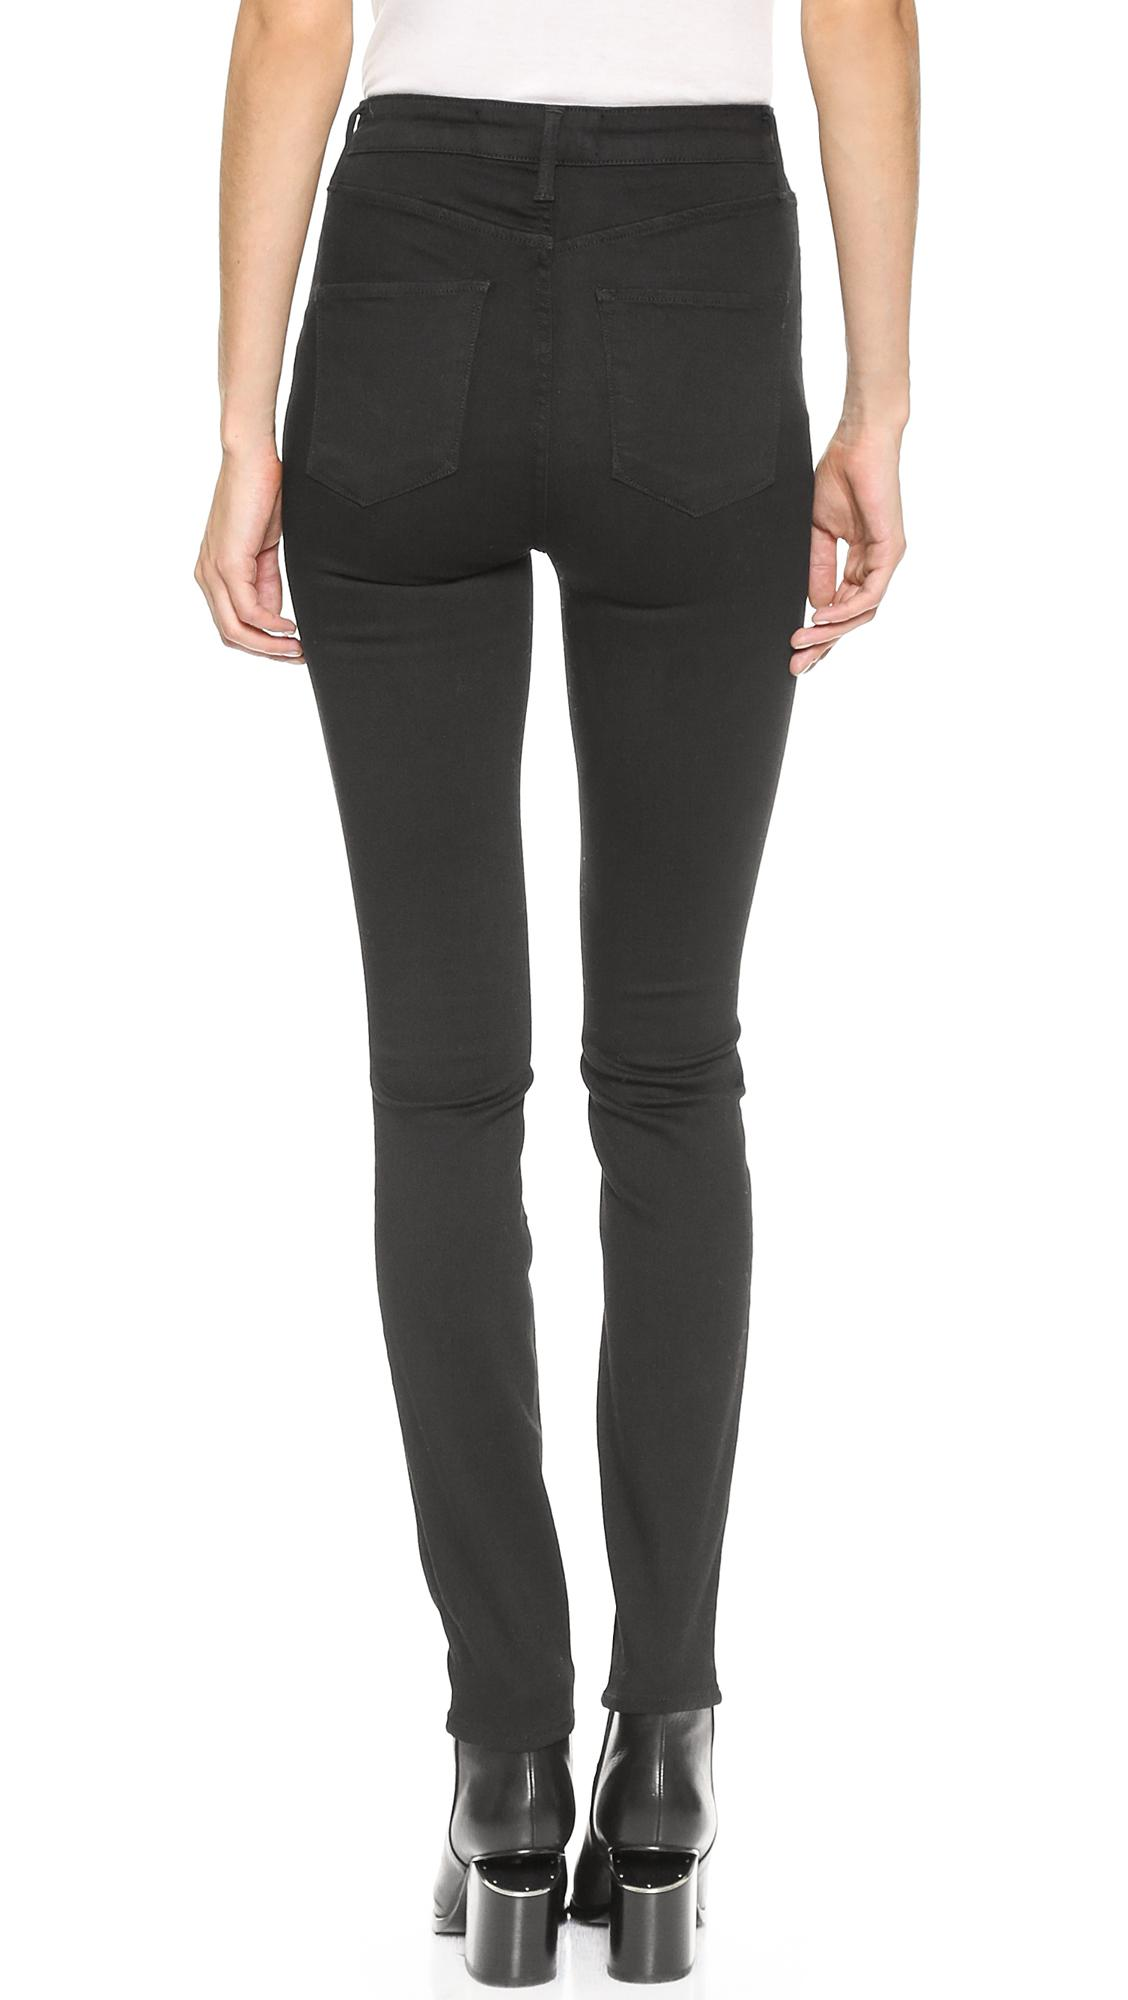 Ayr High Rise Skinny Jeans - Jet Black